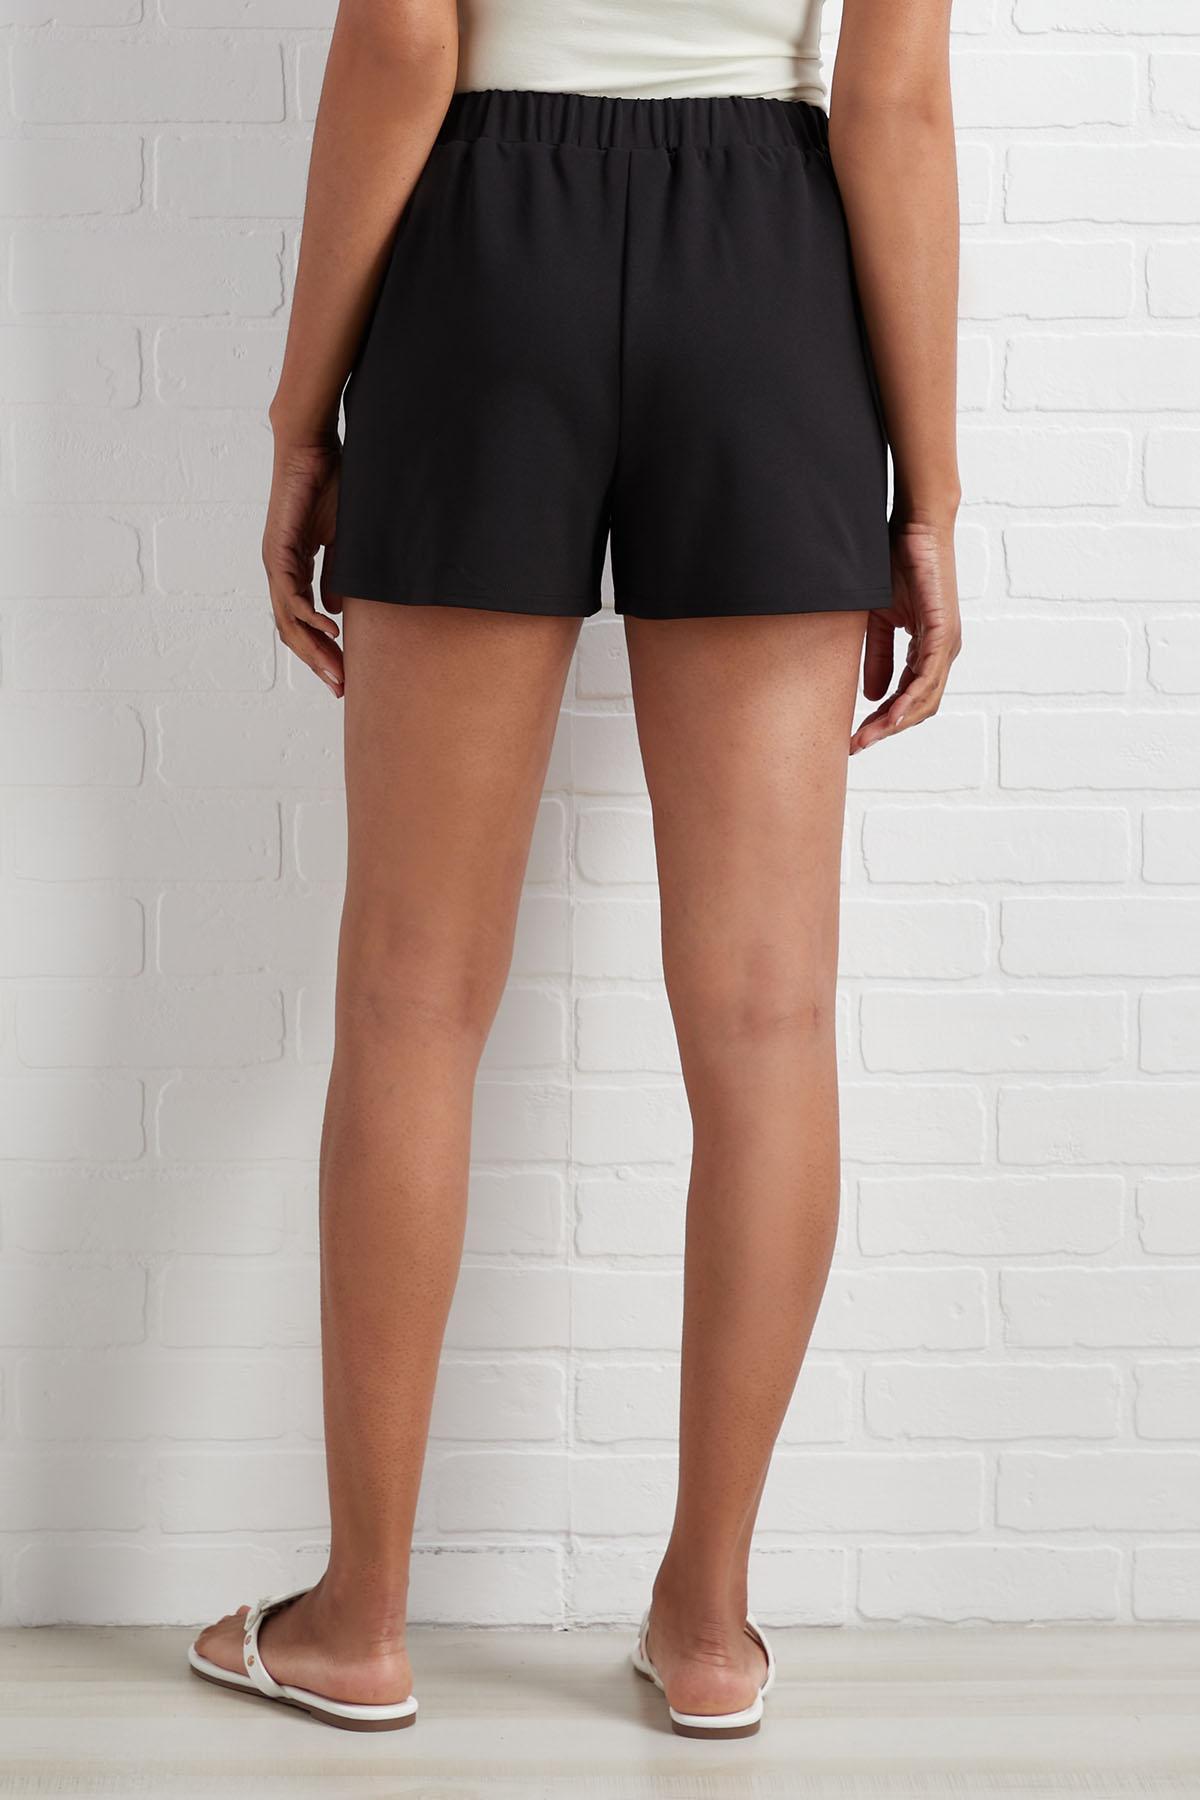 Coastal Cutie Shorts